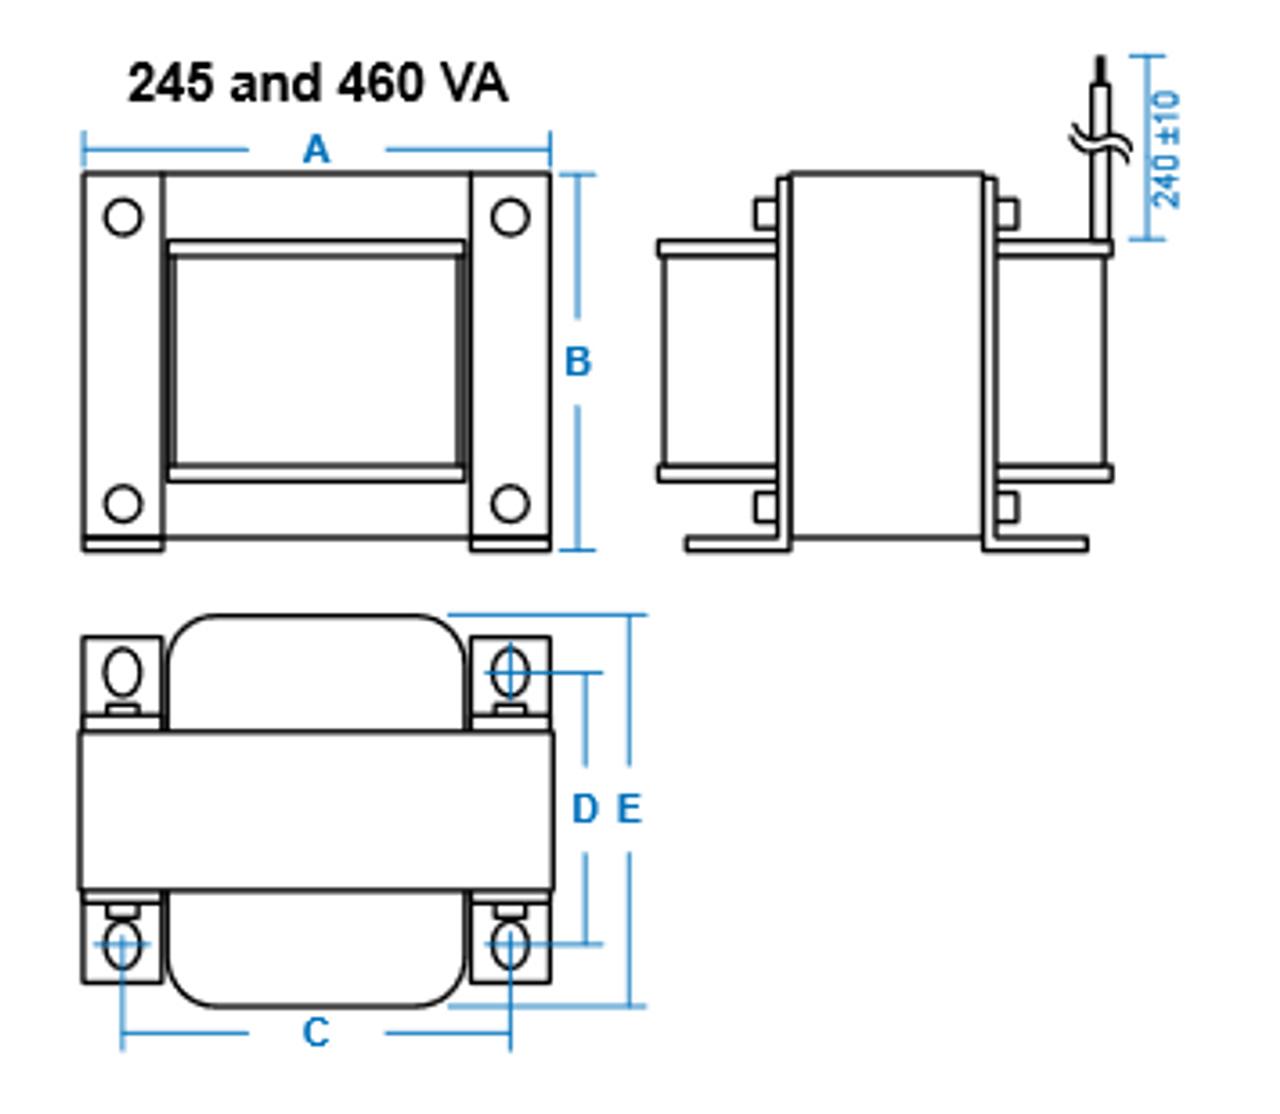 trp 480 347 277 series 460va dimensions  [ 1280 x 1114 Pixel ]